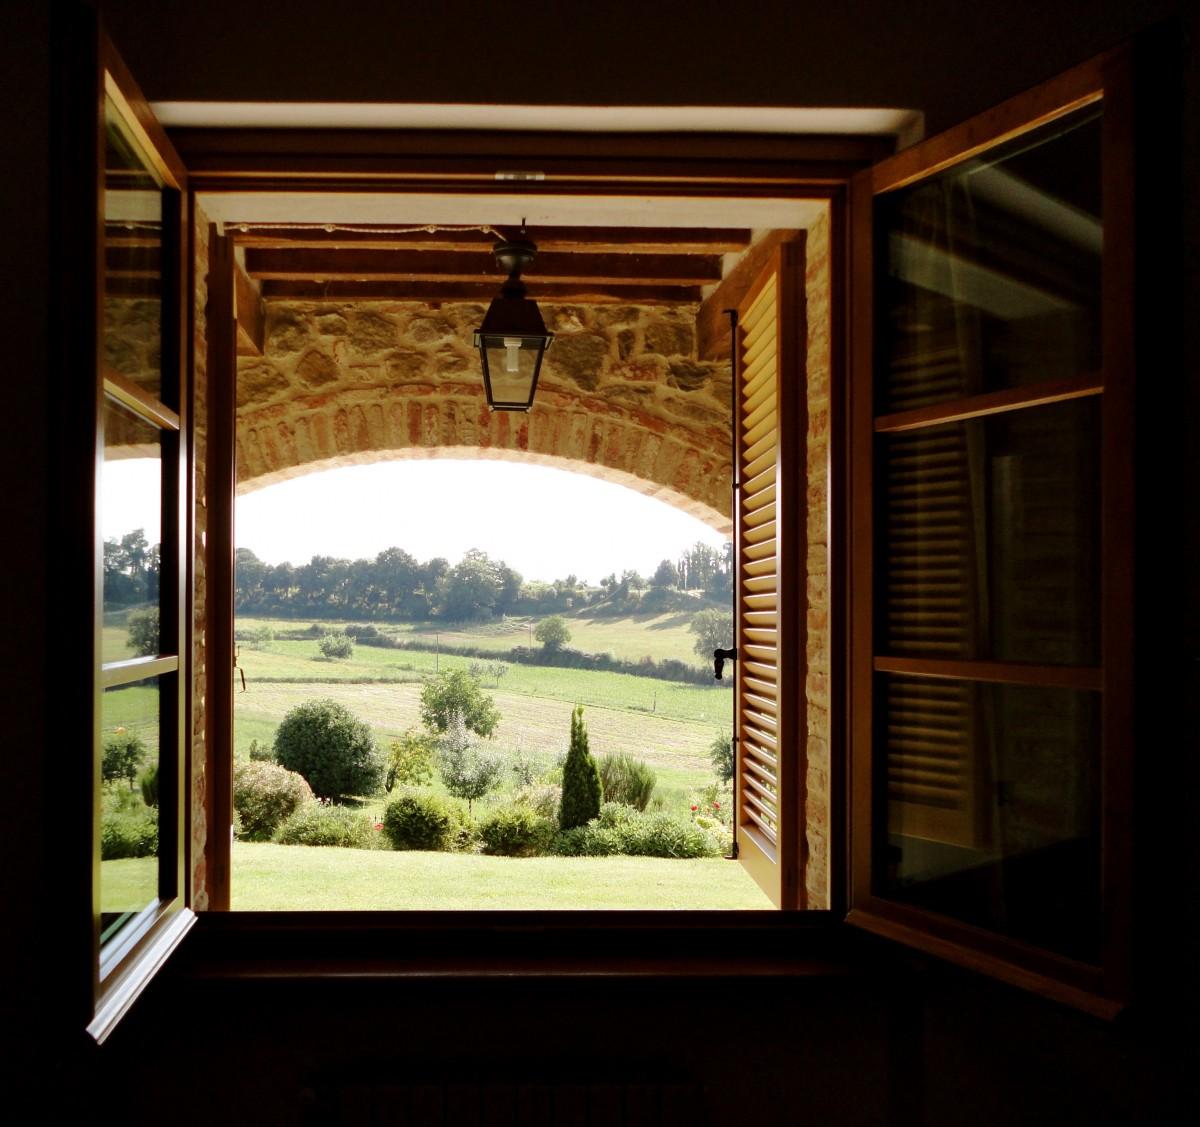 Fotos gratis arquitectura madera palacio casa ver for Diseno de interiores de casas gratis